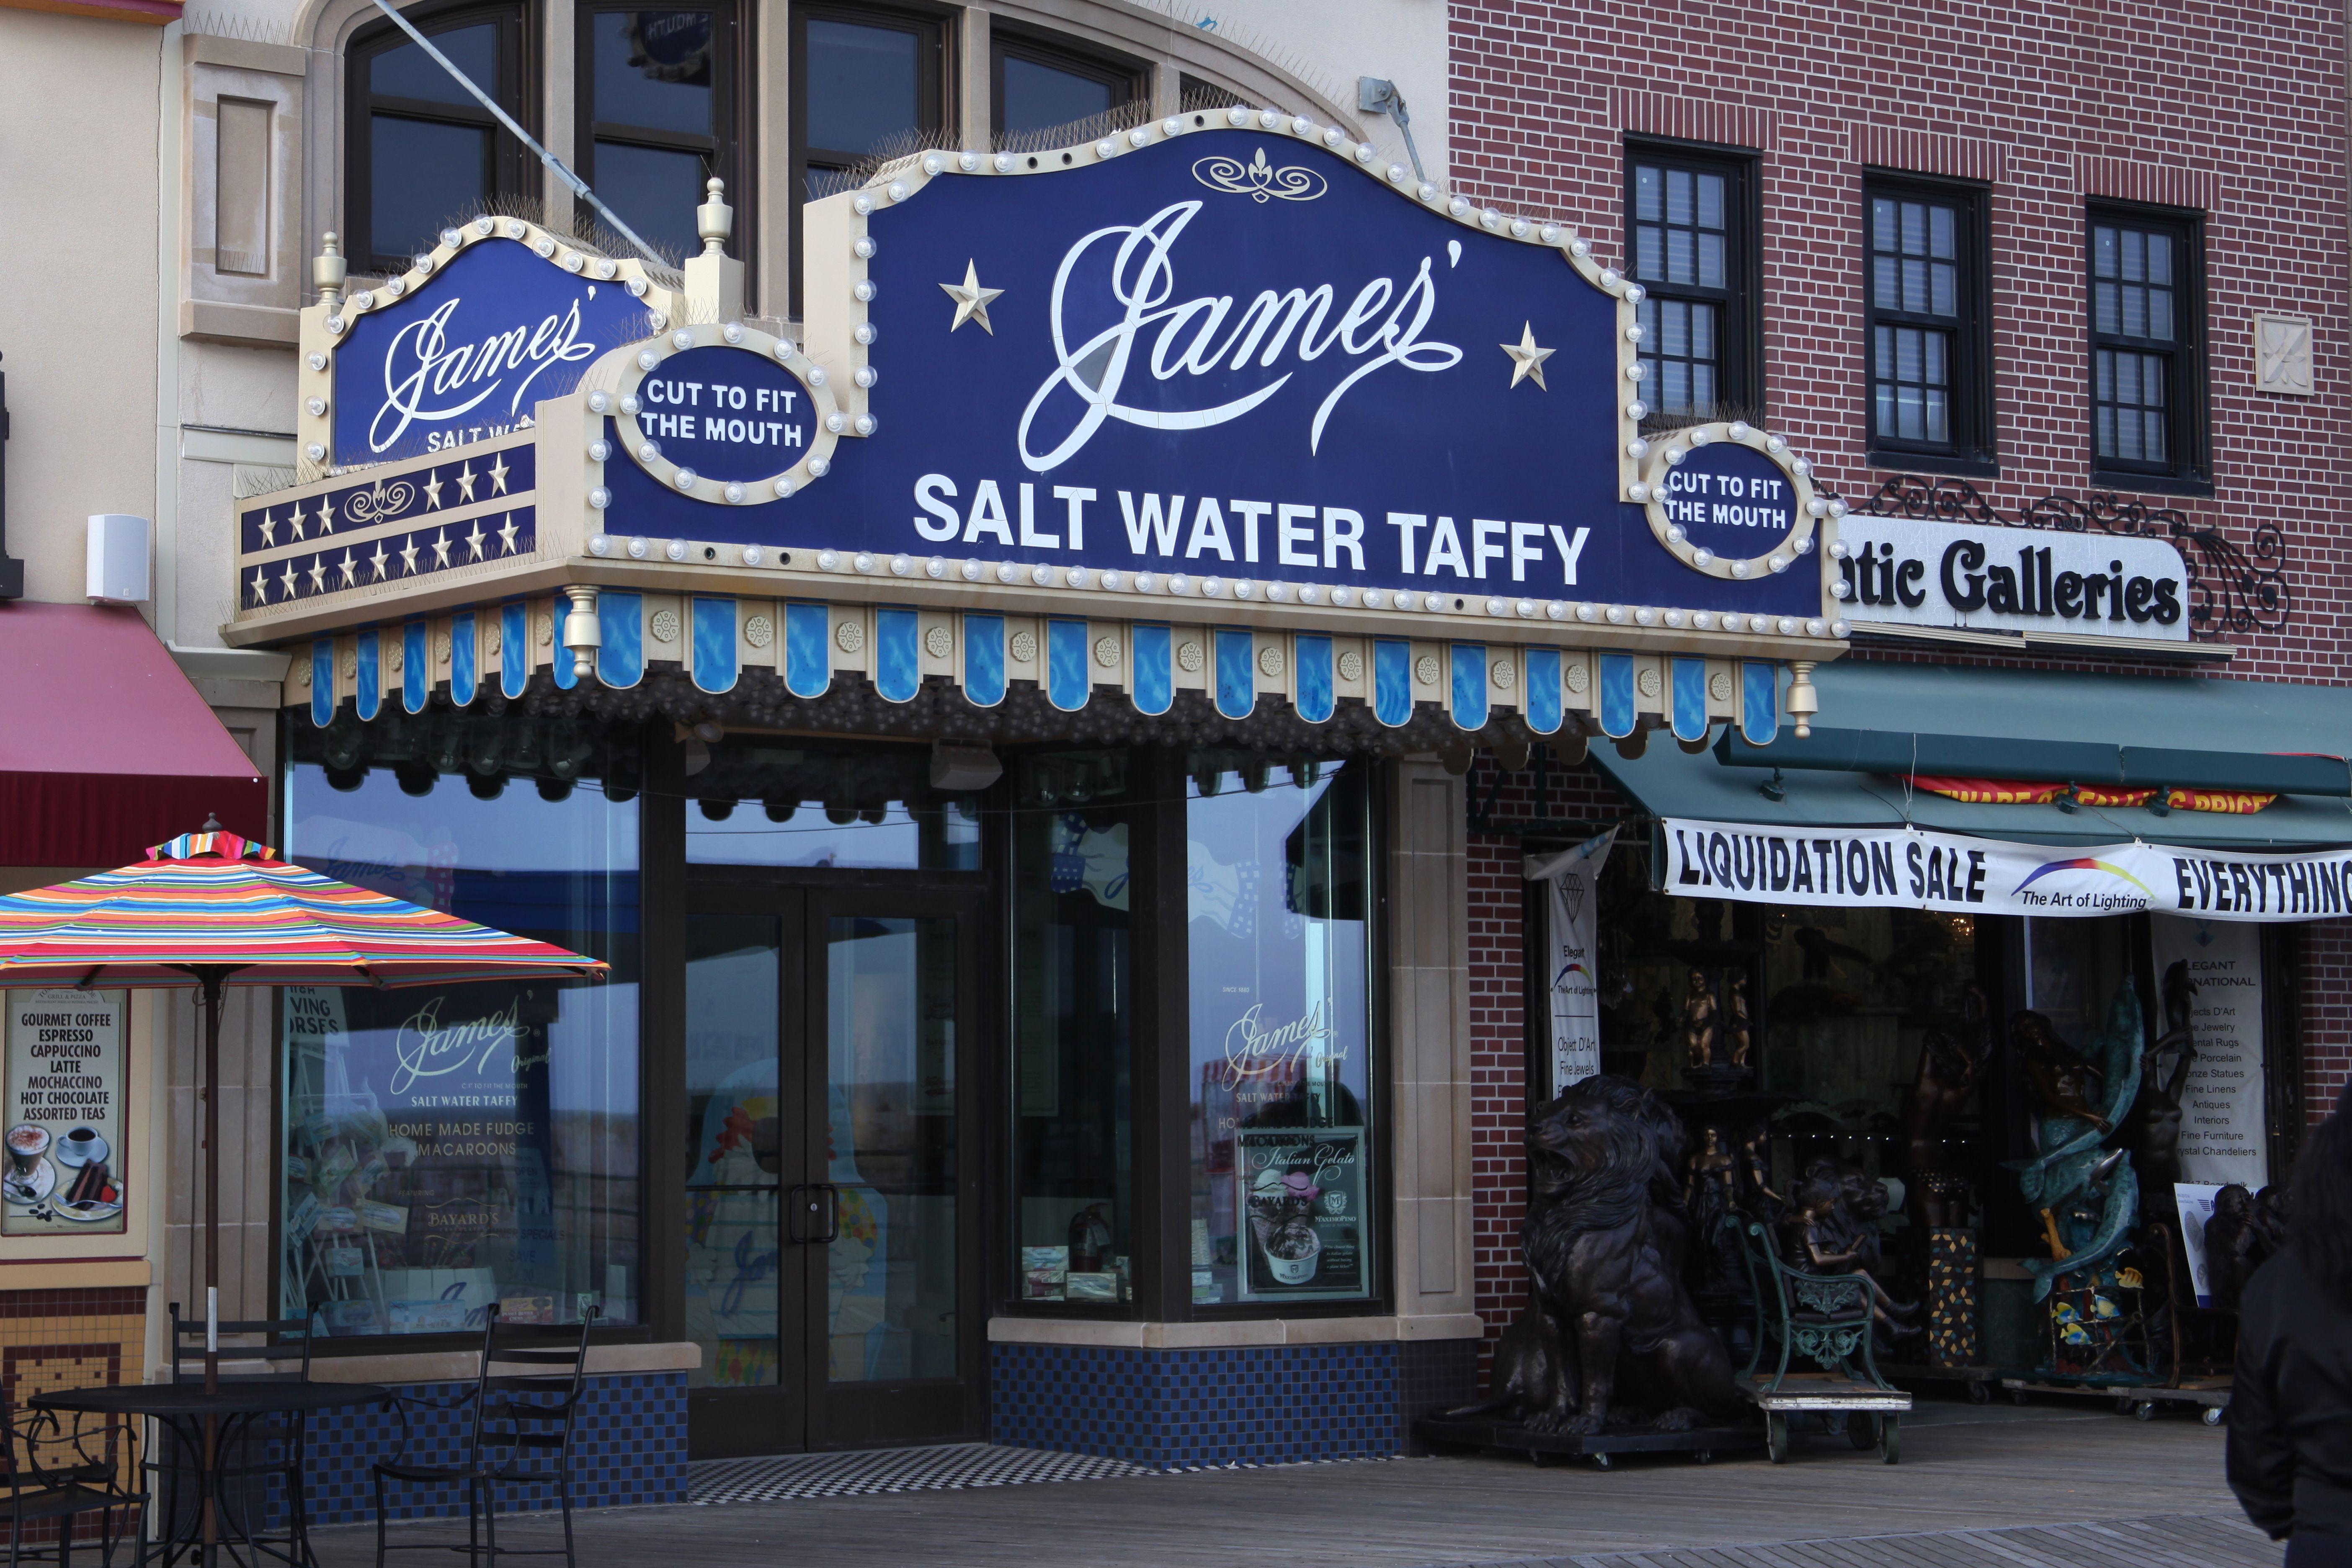 Atlantic City Salt Water Taffy Google Search Atlantic City Salt Water Taffy Stay The Night